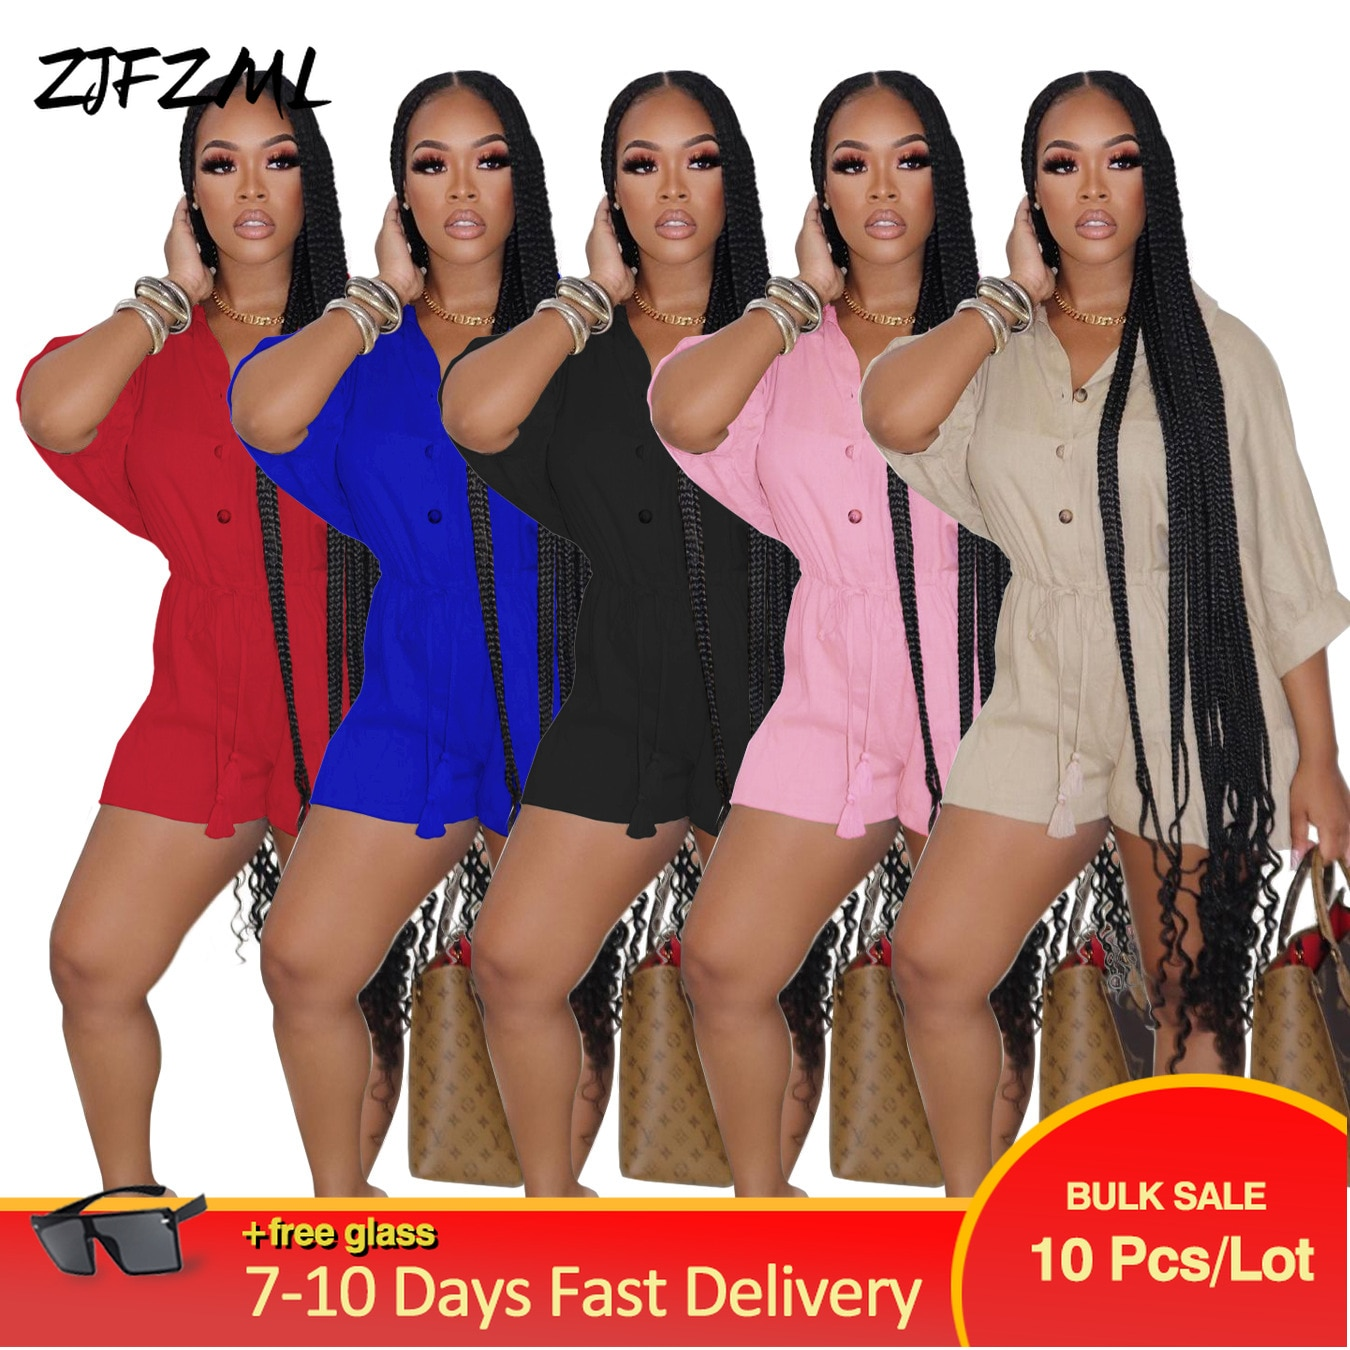 Bulk Items Wholesale Lots Early Fall Short Jumpsuits Women Buttons Up Half Sleeve Bohemian Beach Playsuit Bodysuit Streetwear